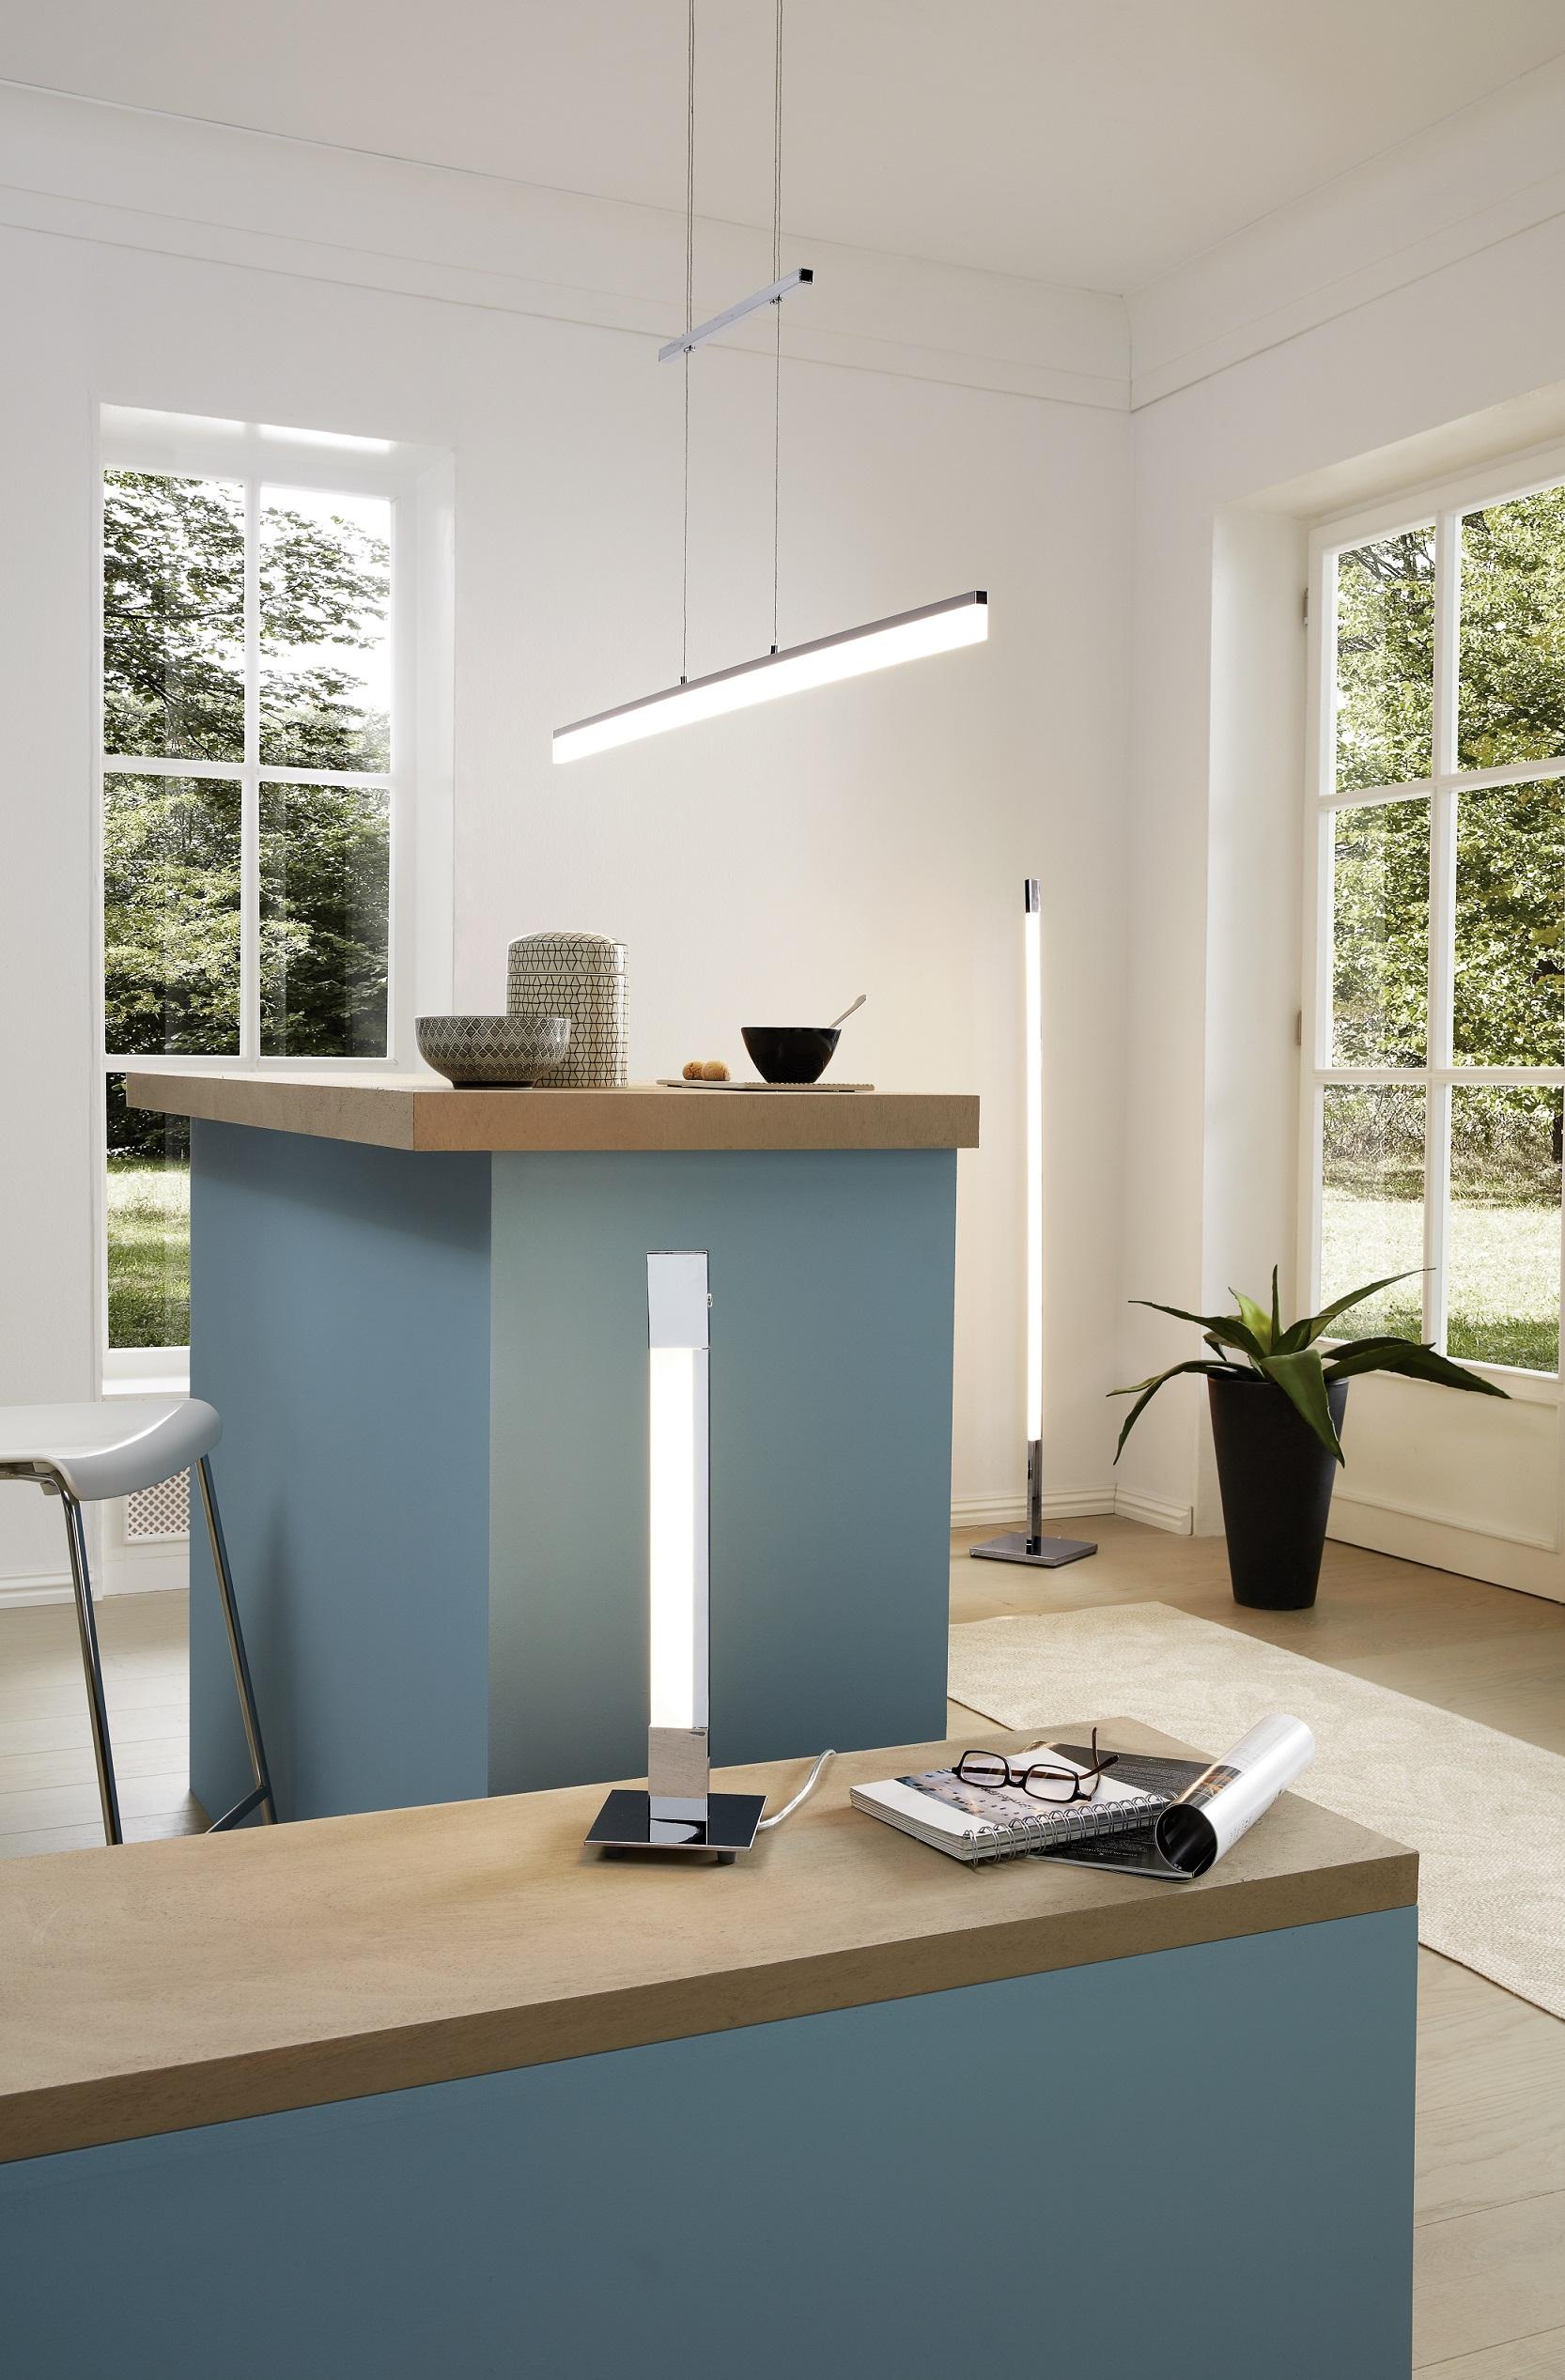 z v sn sv tidlo tarandell eglo 96866 eglo sv tidla. Black Bedroom Furniture Sets. Home Design Ideas